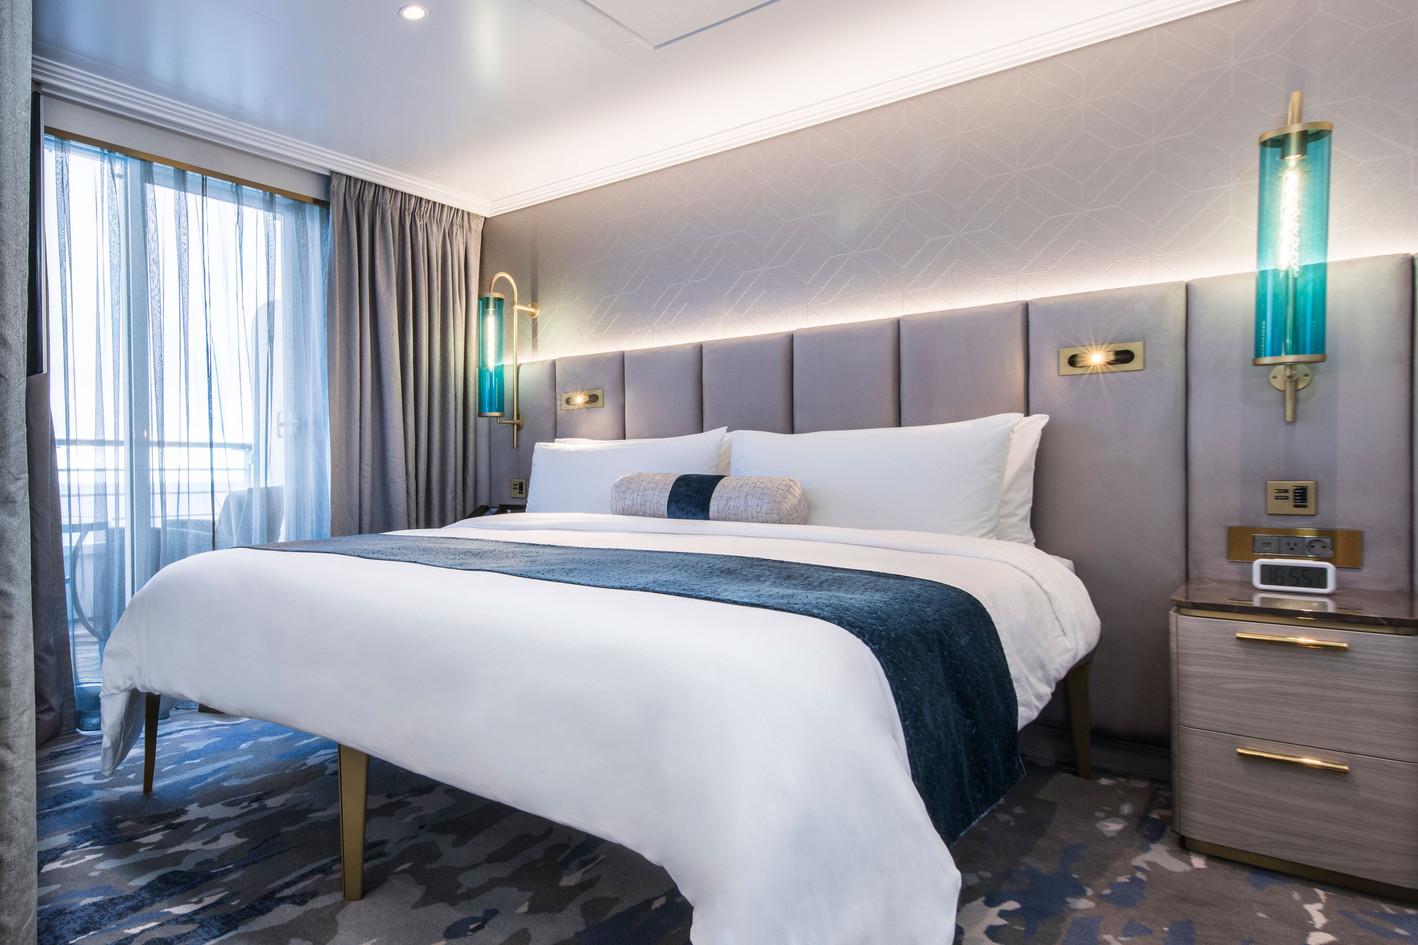 Seabreeze Penthouse Suite (SP) with Verandah Bedroom